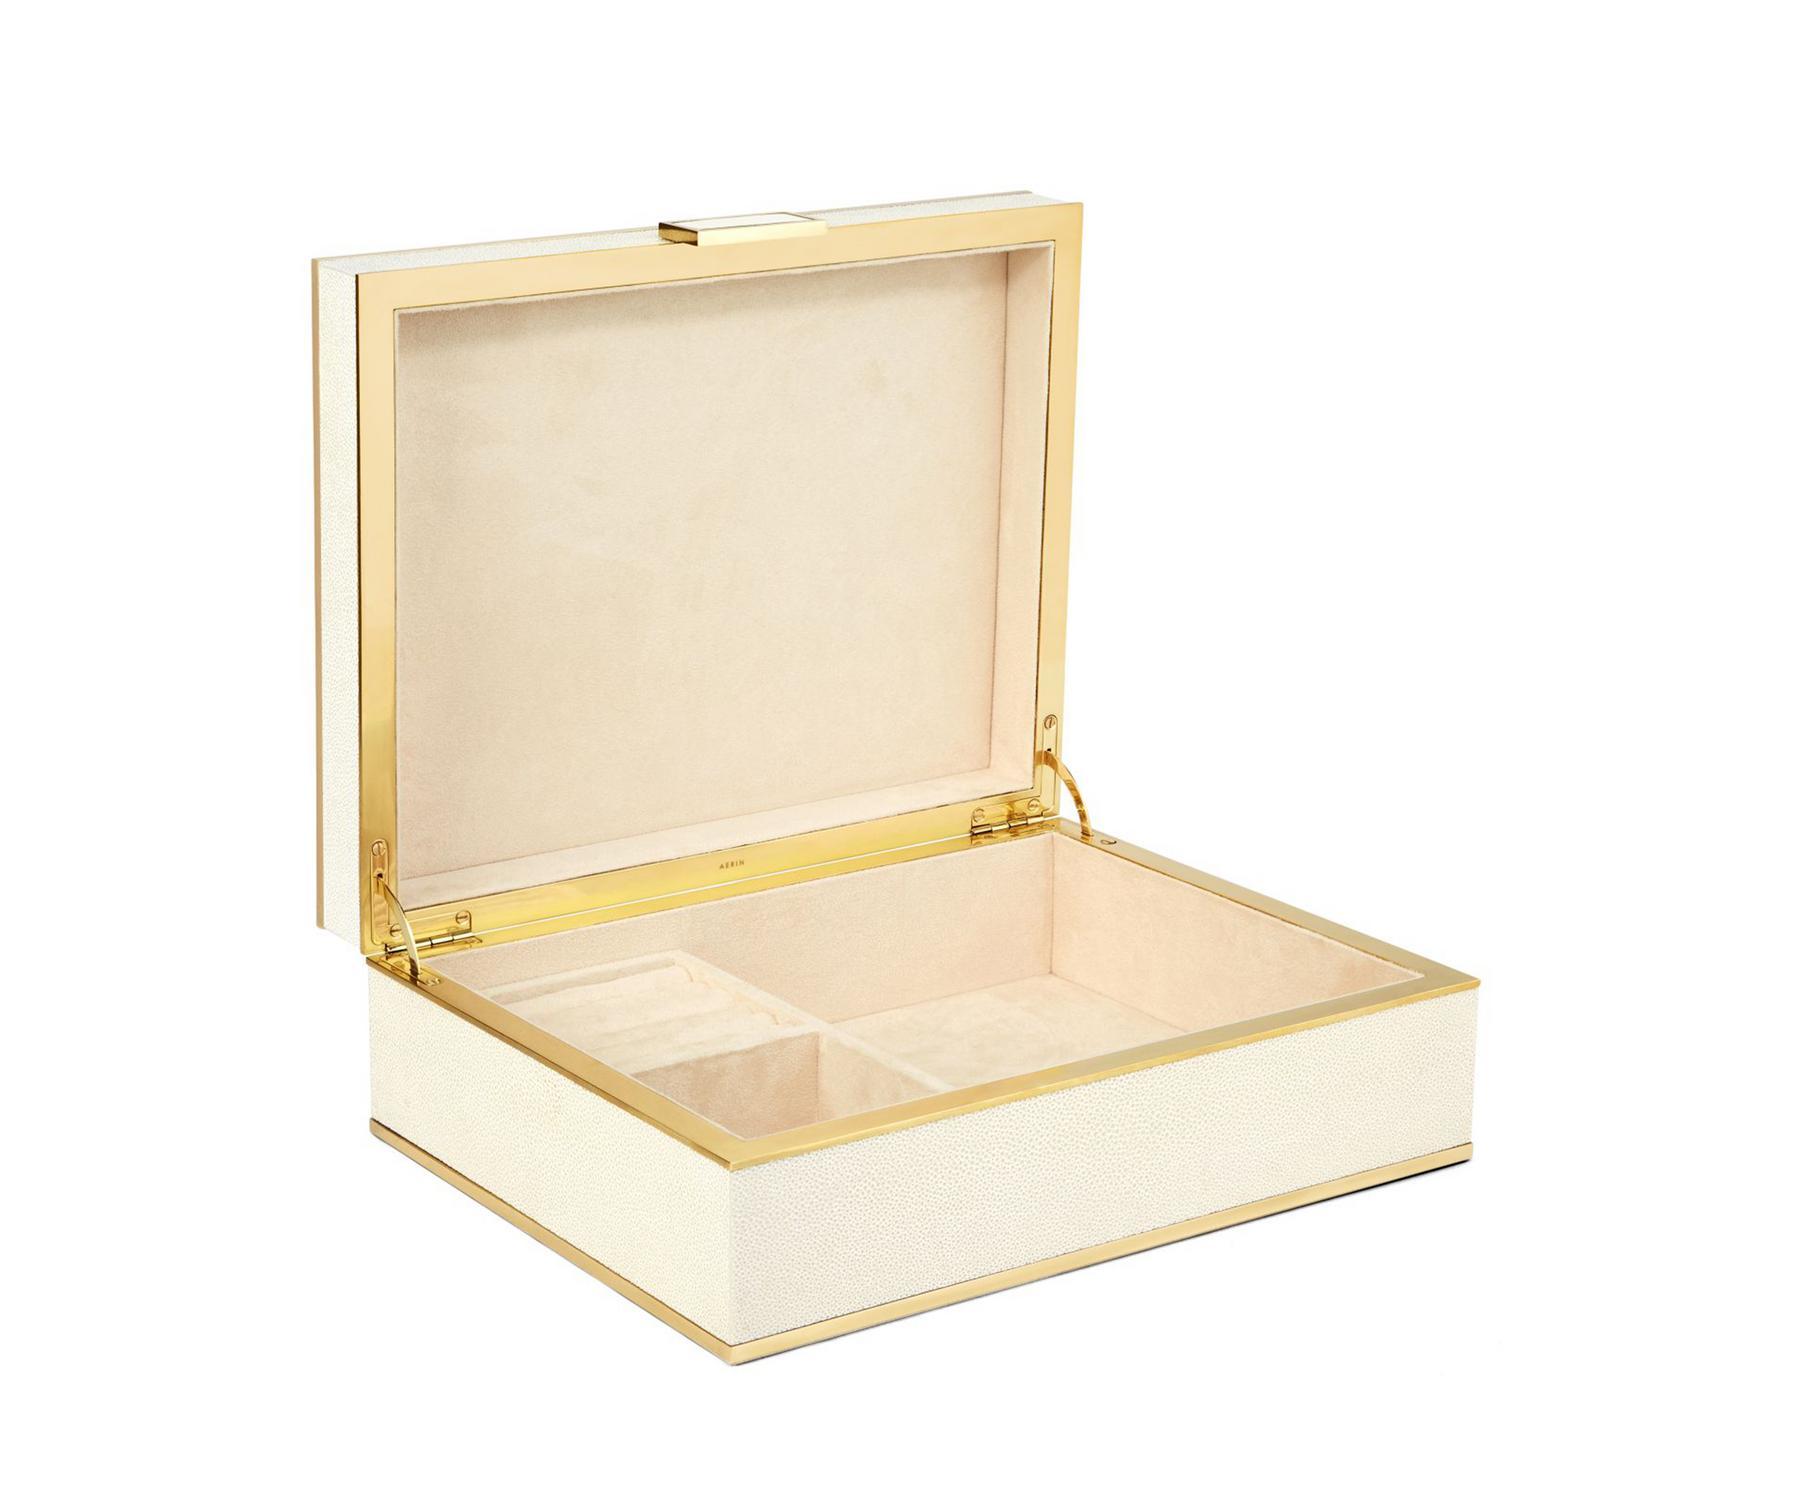 Super swag jewelry box, a stylish home upgrade.